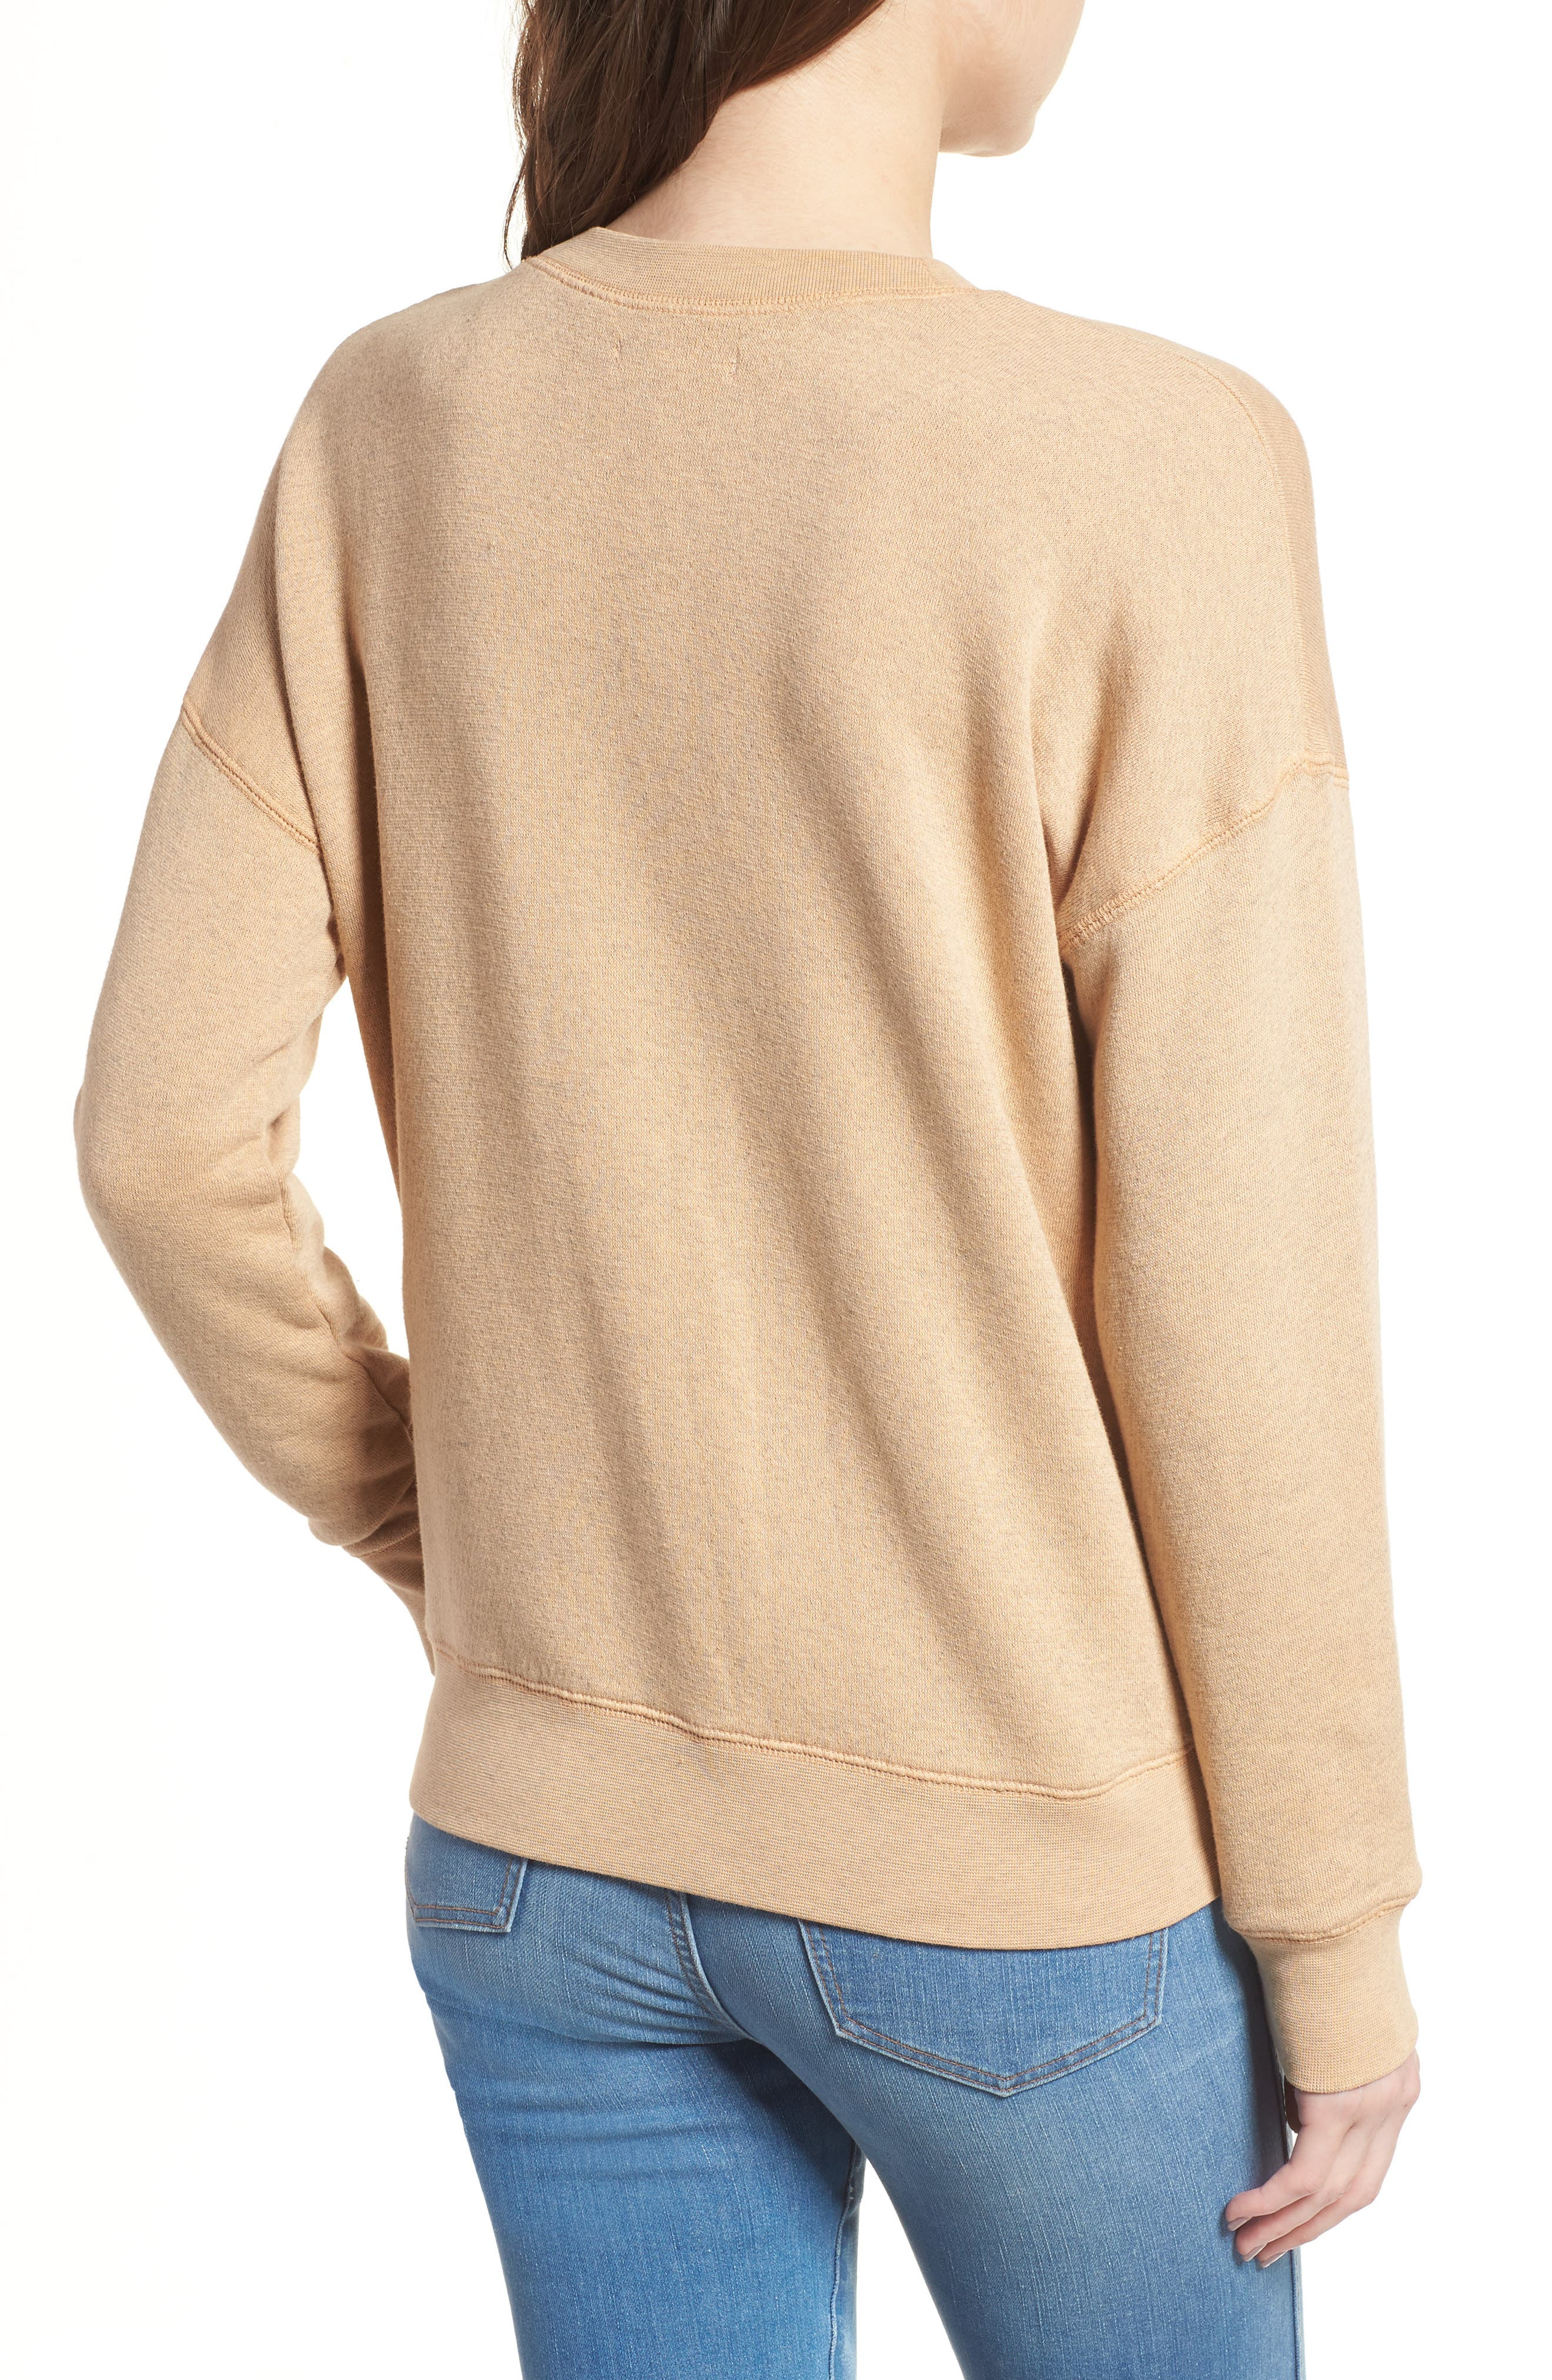 Mainstay Sweatshirt,                             Alternate thumbnail 2, color,                             Hthr Dune